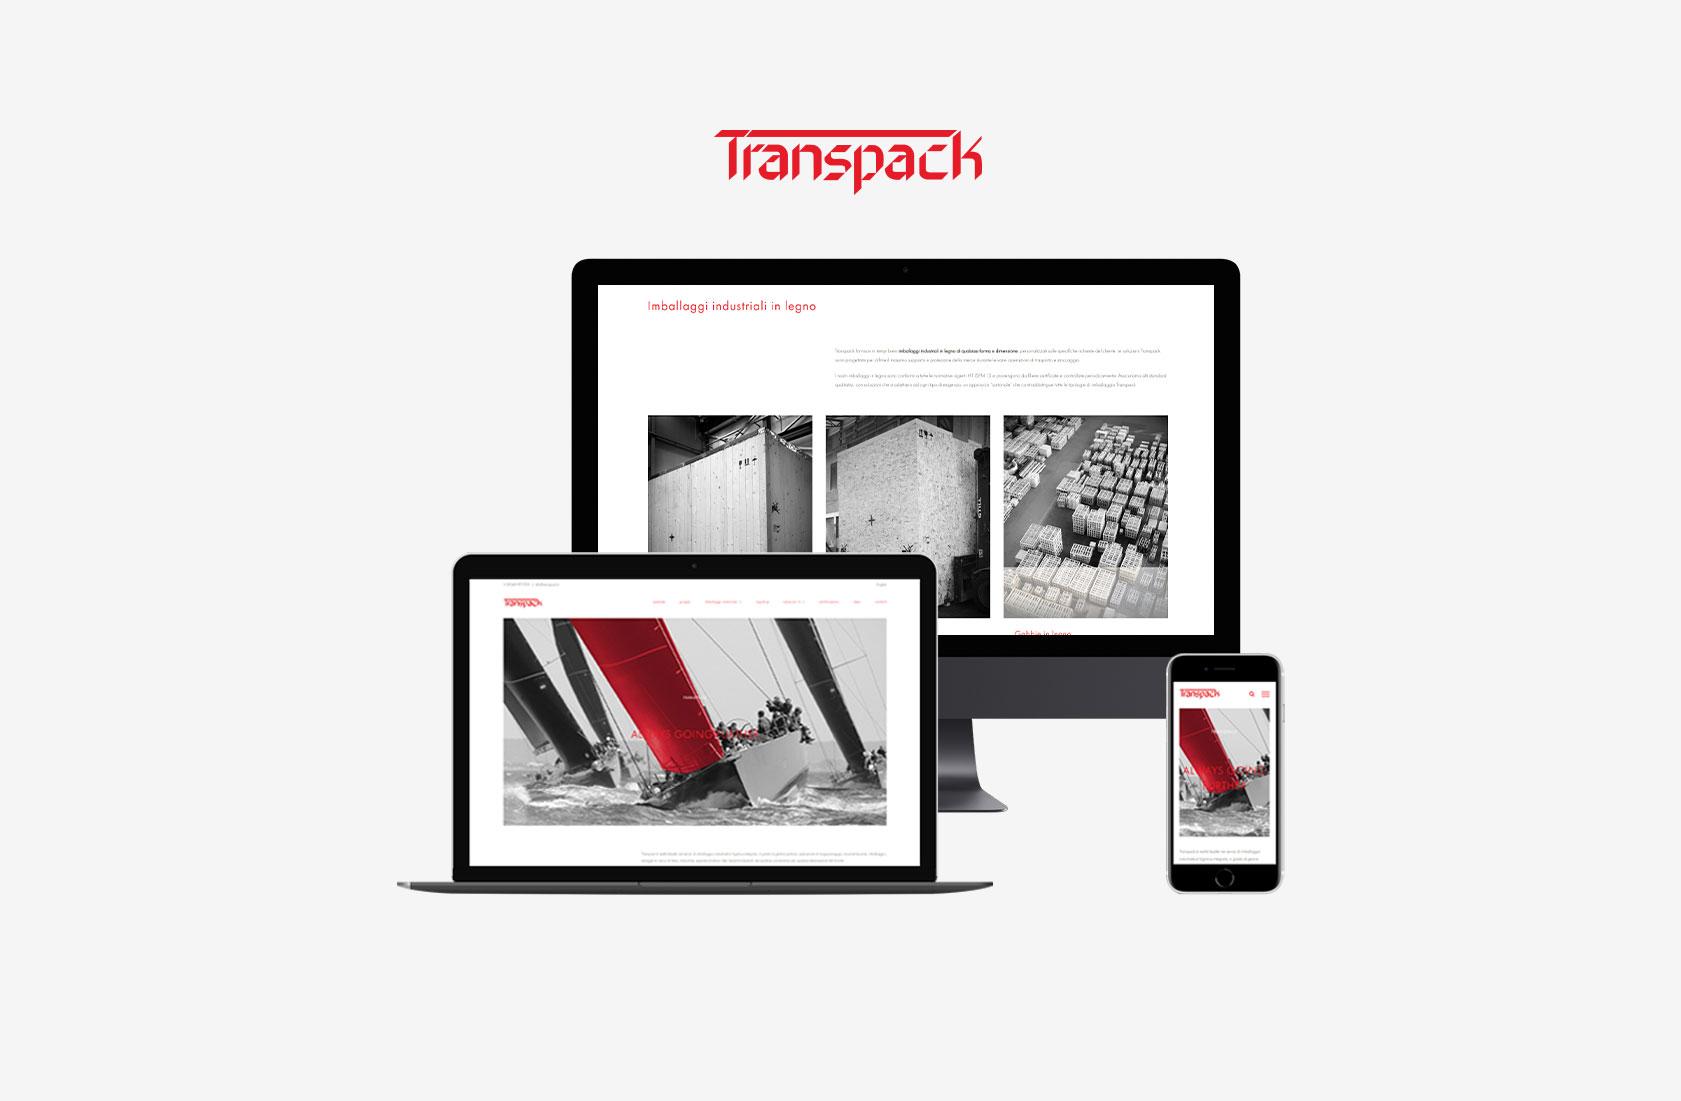 Nuovo sito transpack.it